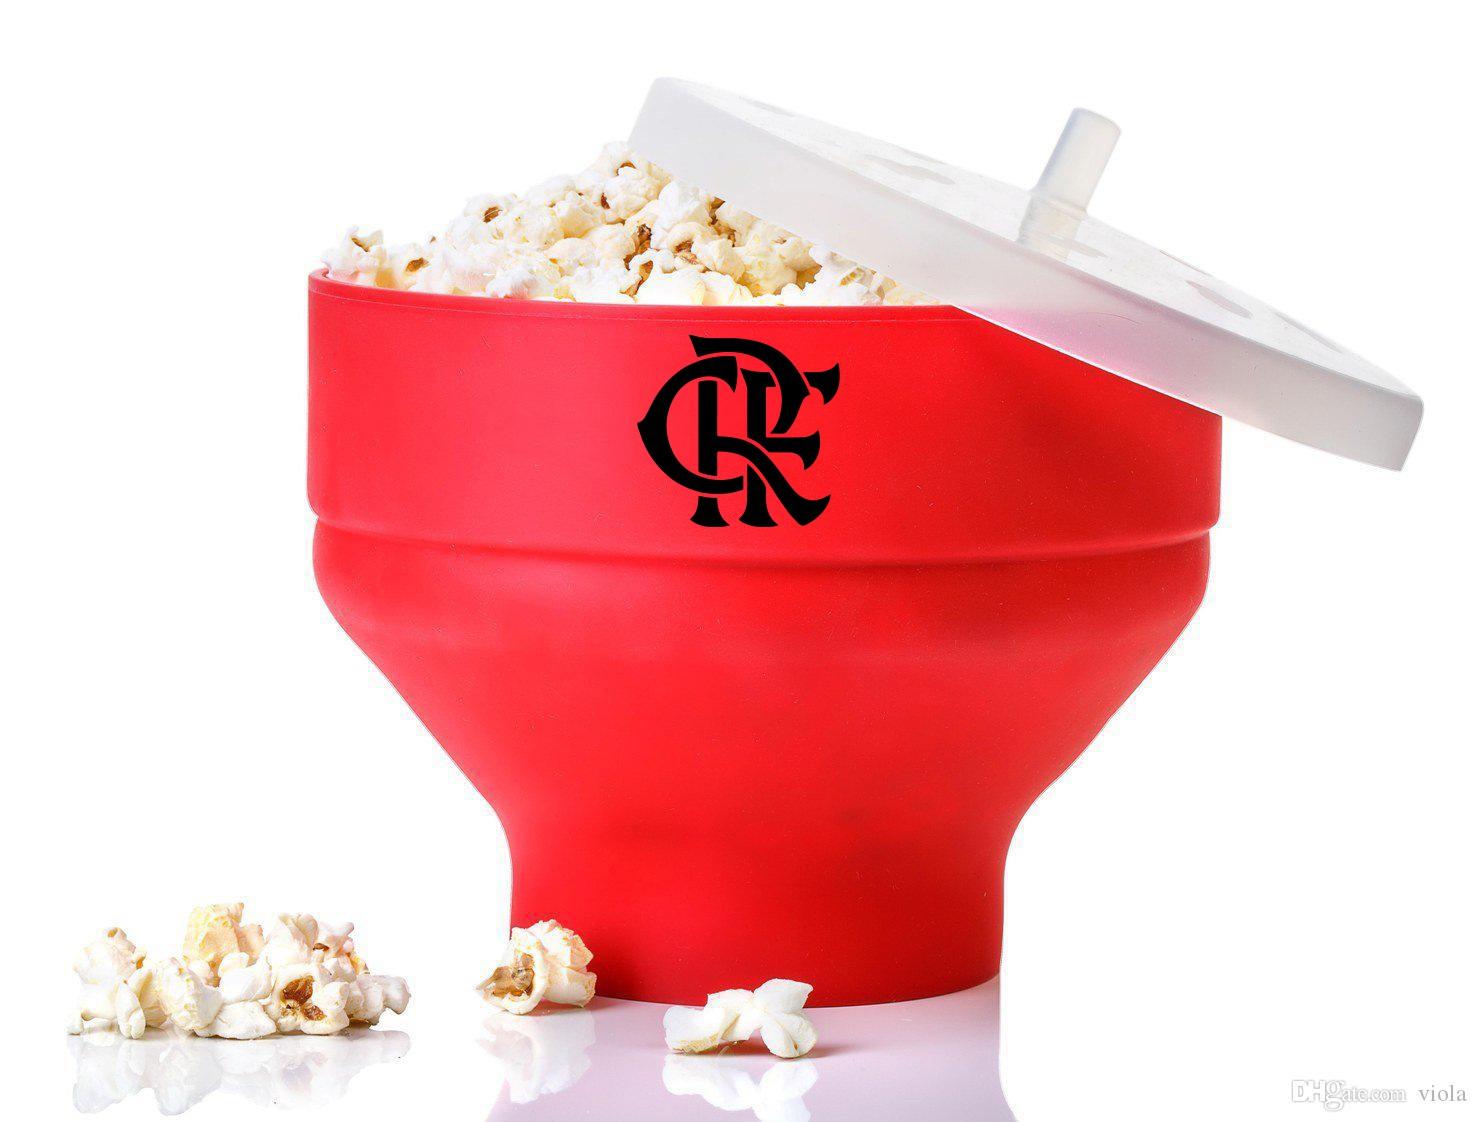 Pipoqueira de Silicone Para Microondas do Flamengo